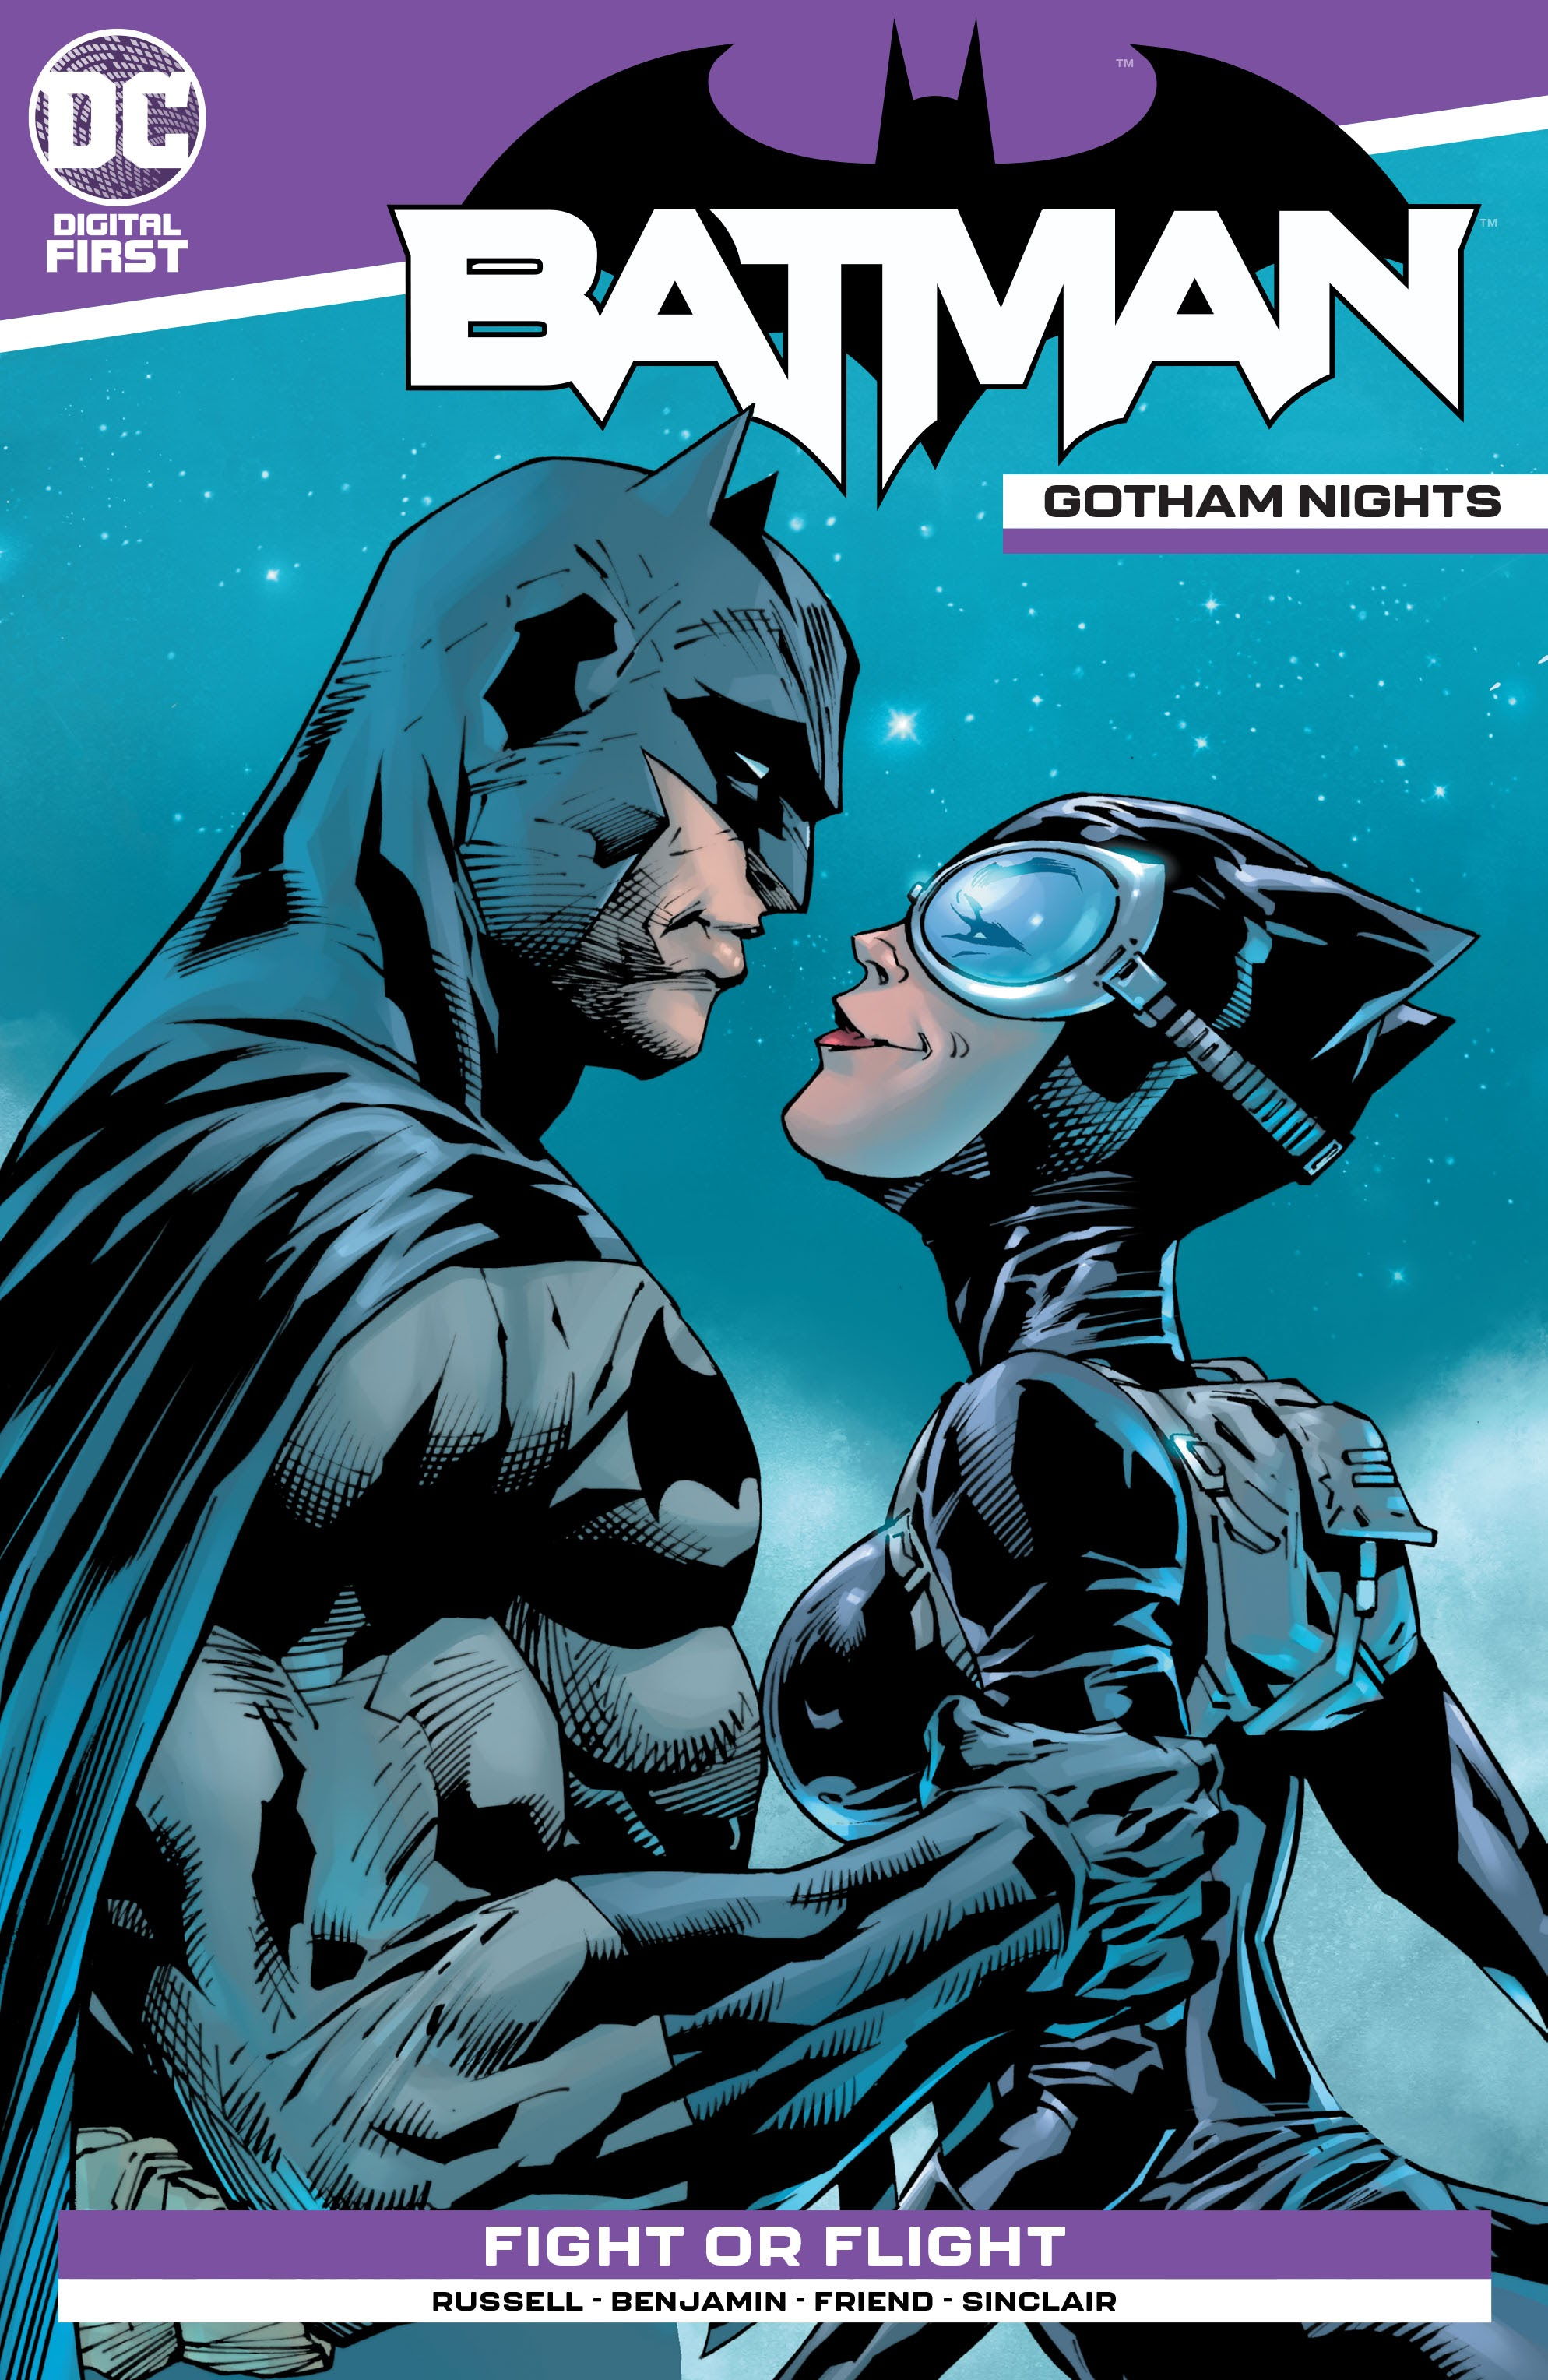 Batman: Gotham Nights Vol 1 15 (Digital)